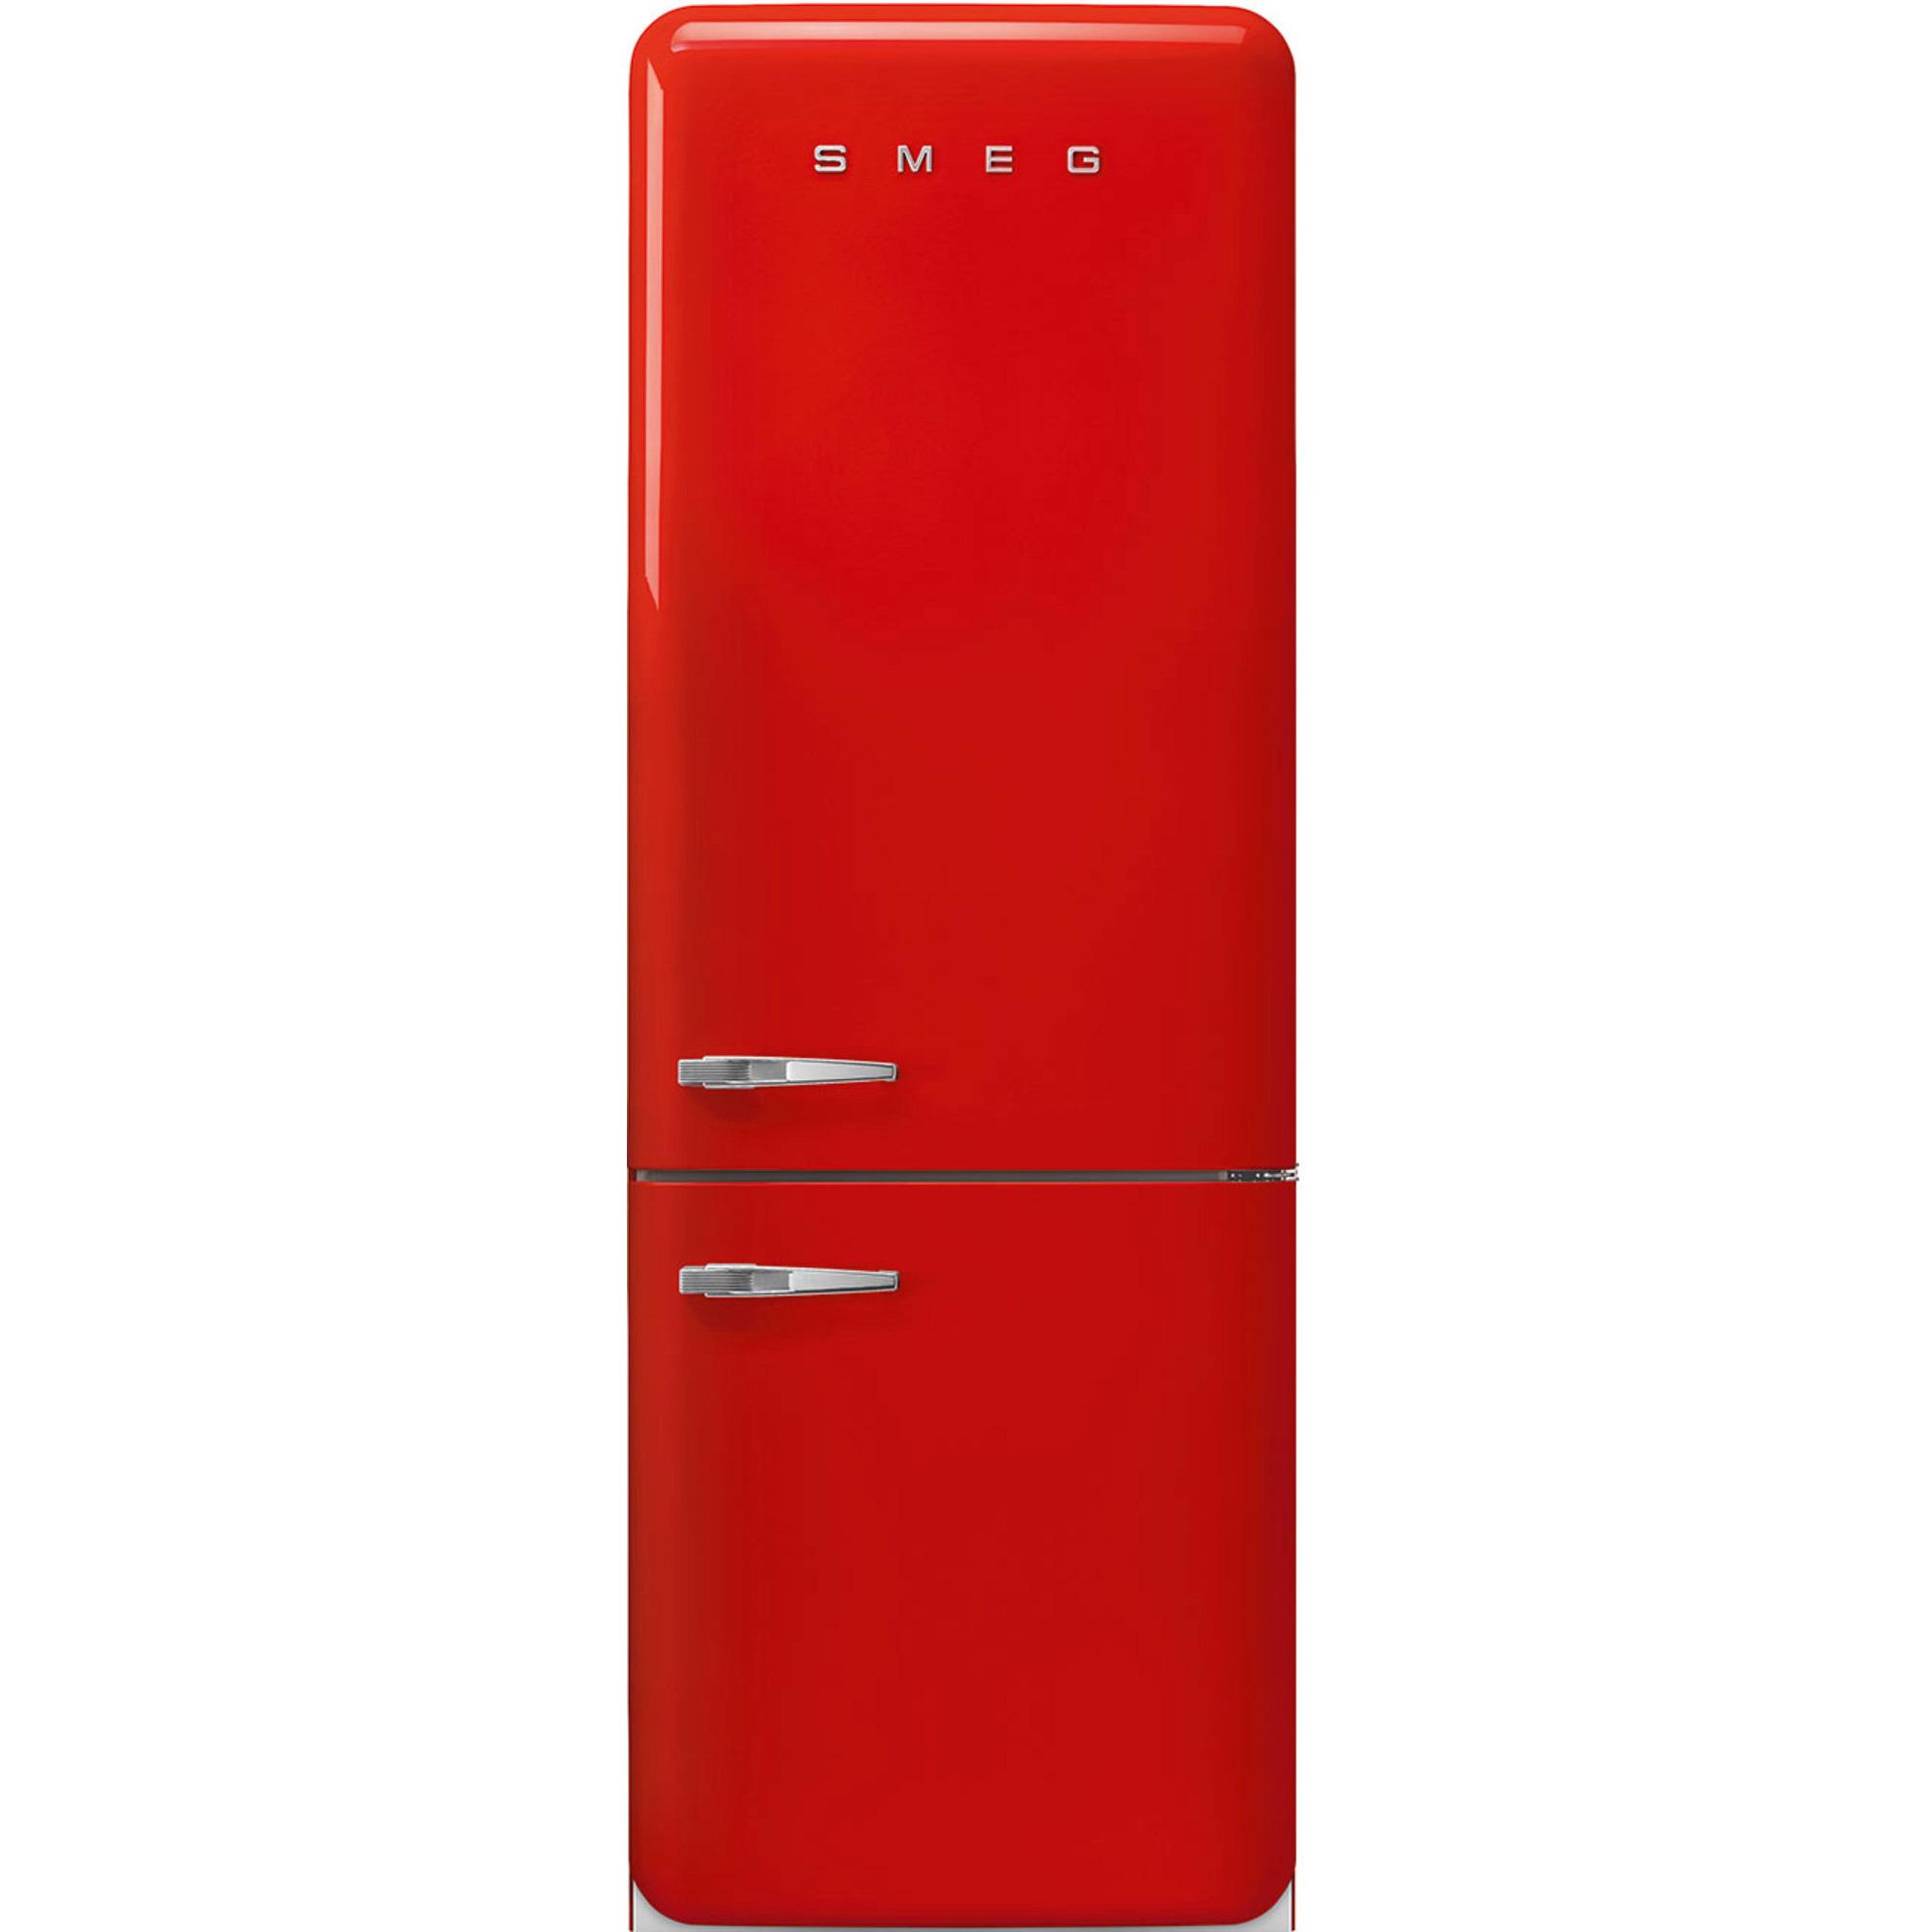 Smeg 205 cm Högerhängt Kylskåp/frys i 50-tals Retrodesign Röd